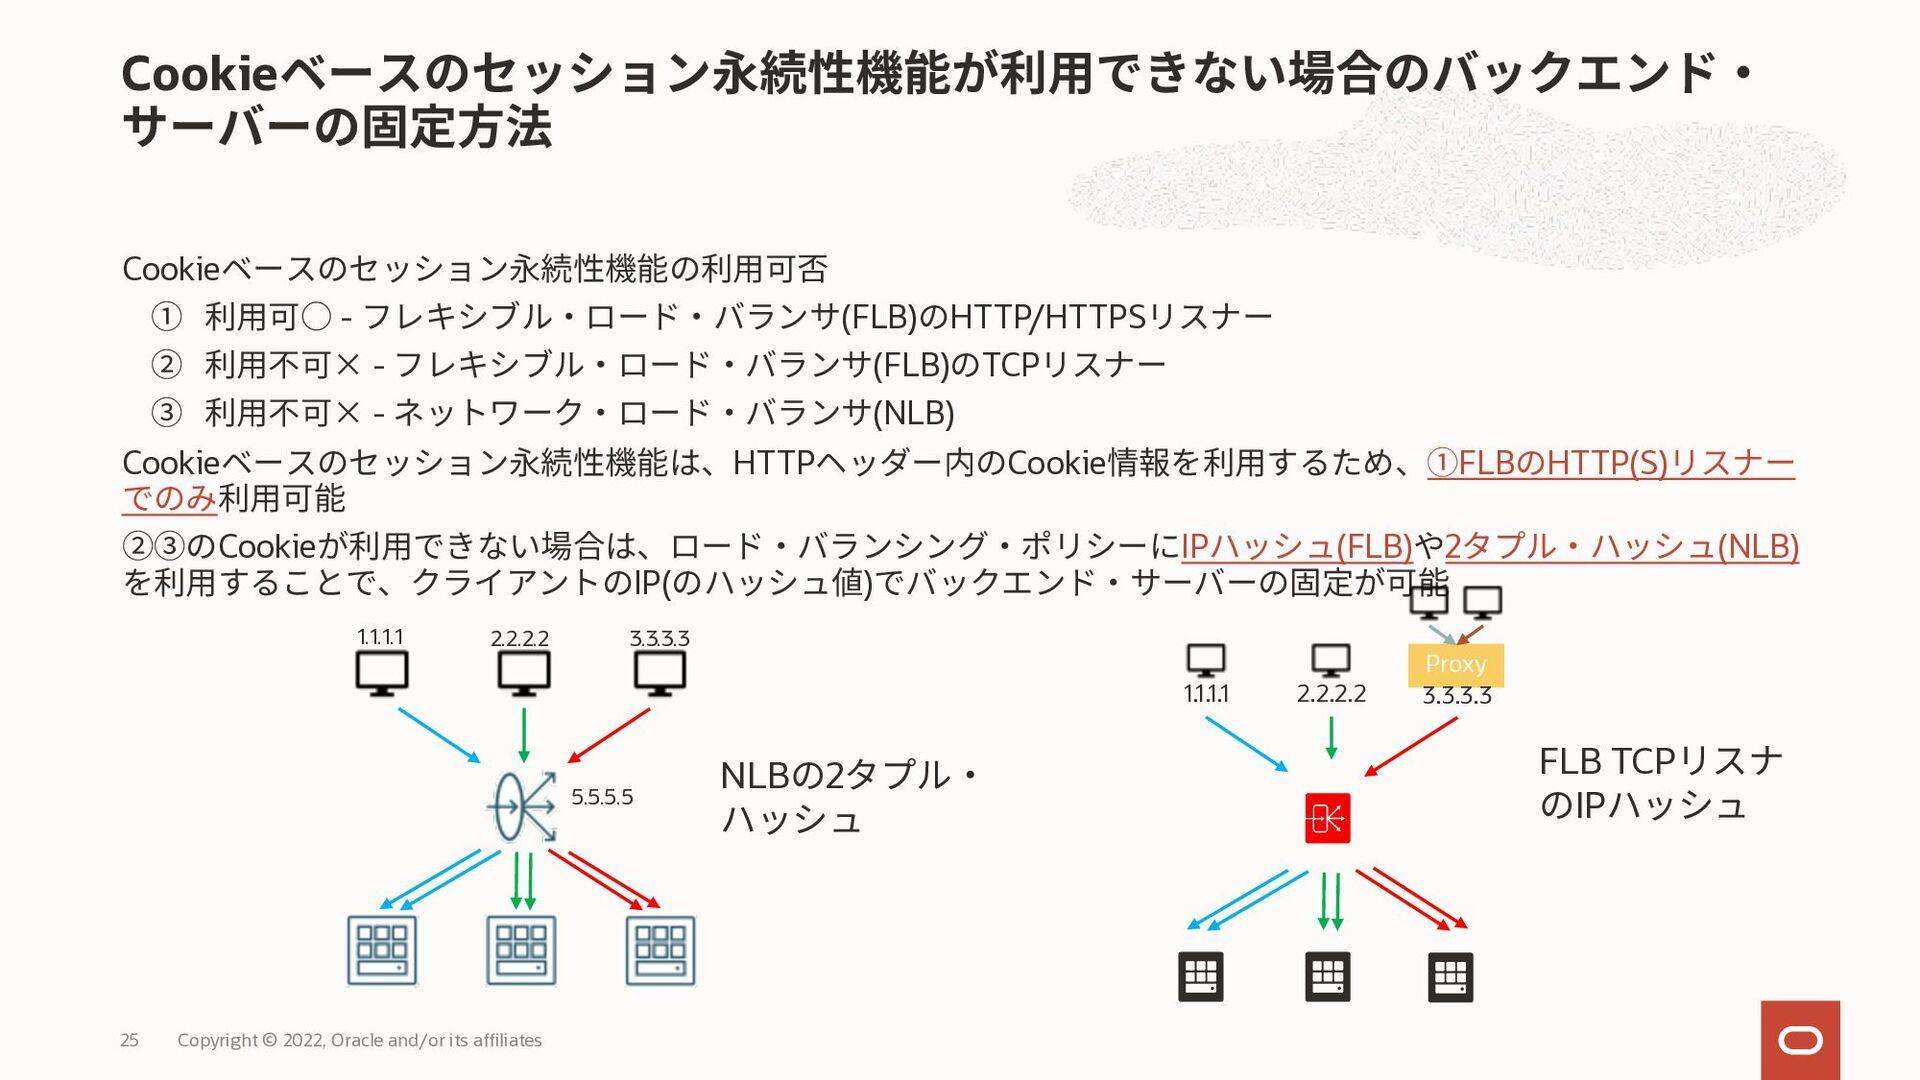 RSAキーの作成 証明書署名要求 (CSR) の作成 SSLの設定ステップ - 1. 秘密鍵と...